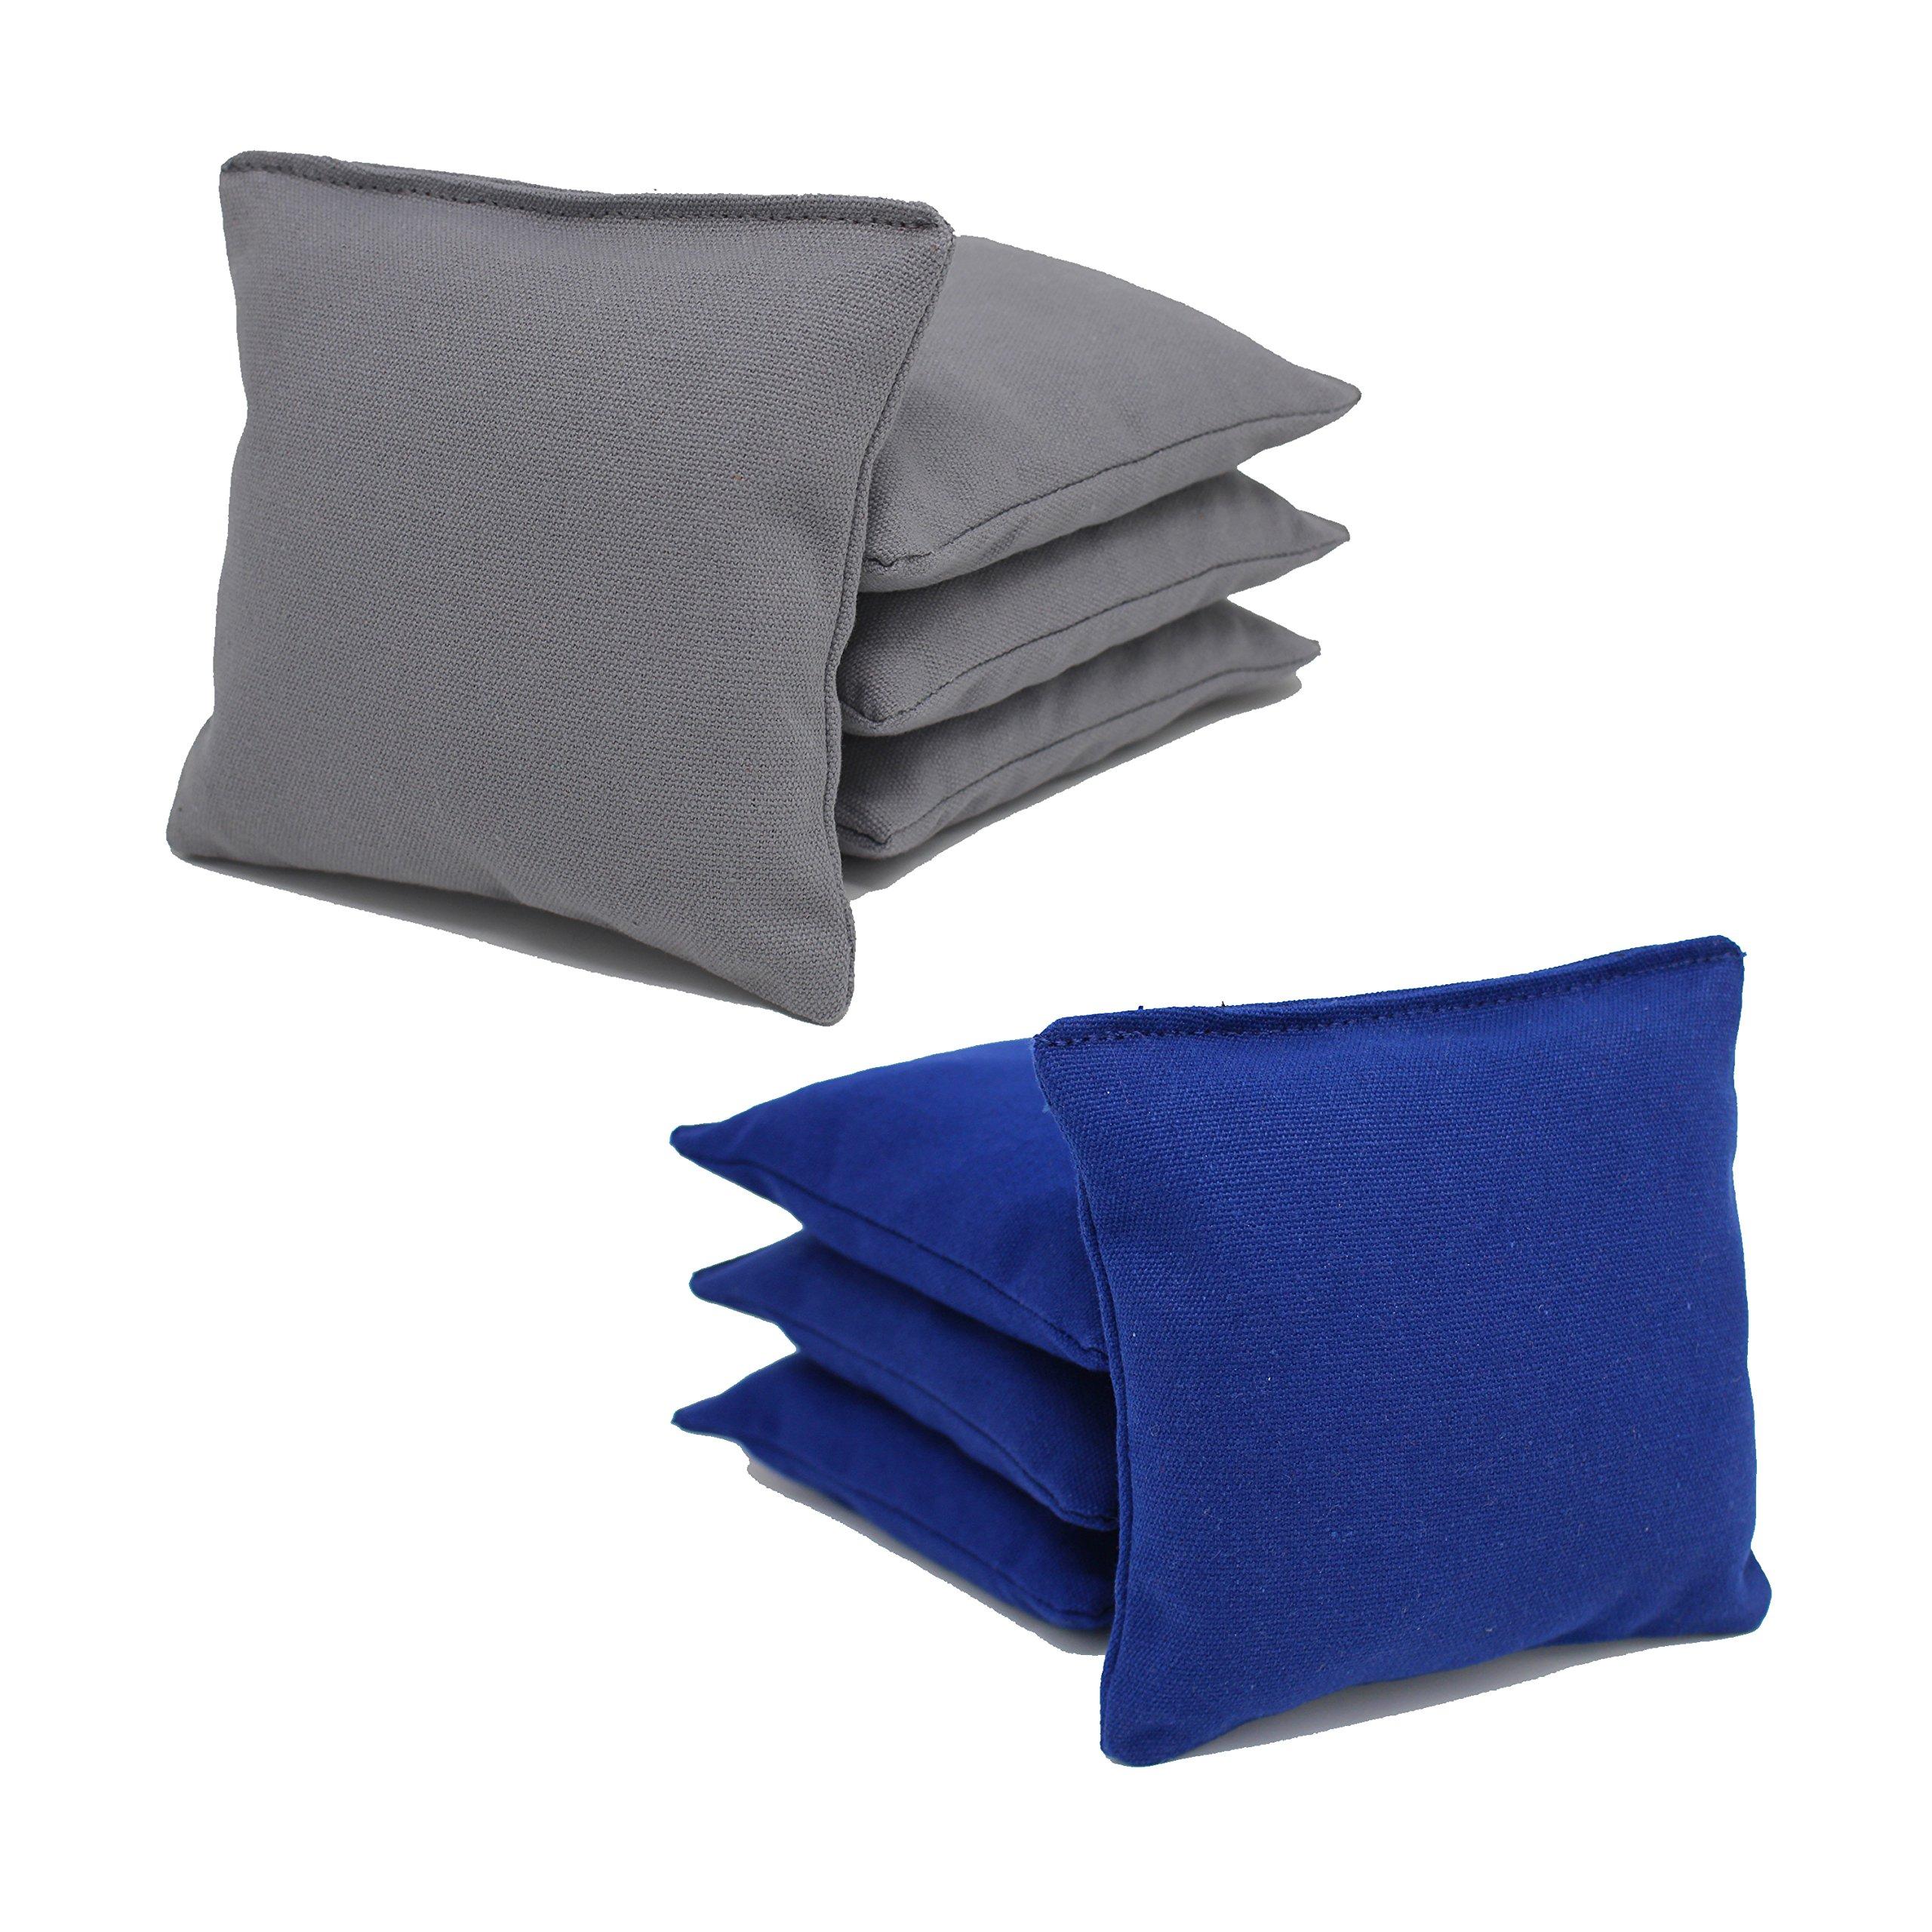 Free Donkey Sports Cornhole Bags (Pack of 8), Royal/Gray, Regular by Free Donkey Sports